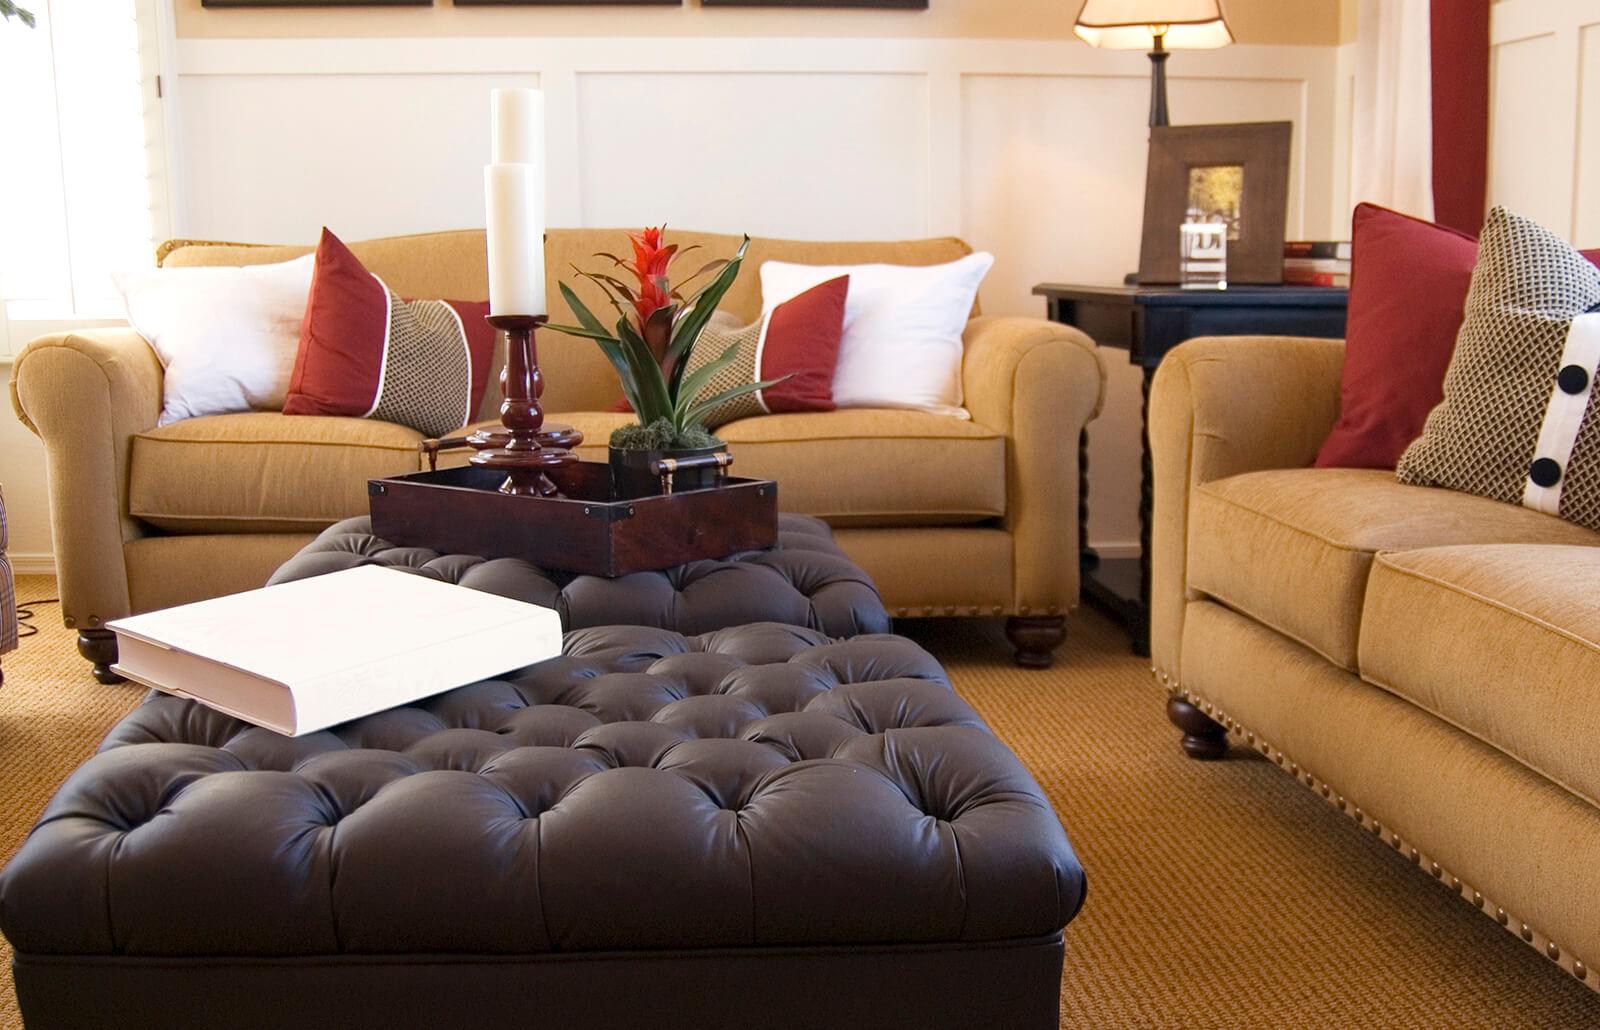 Photo Salon Feng Shui ideas feng shui para diseñar una sala de estar auspiciosa